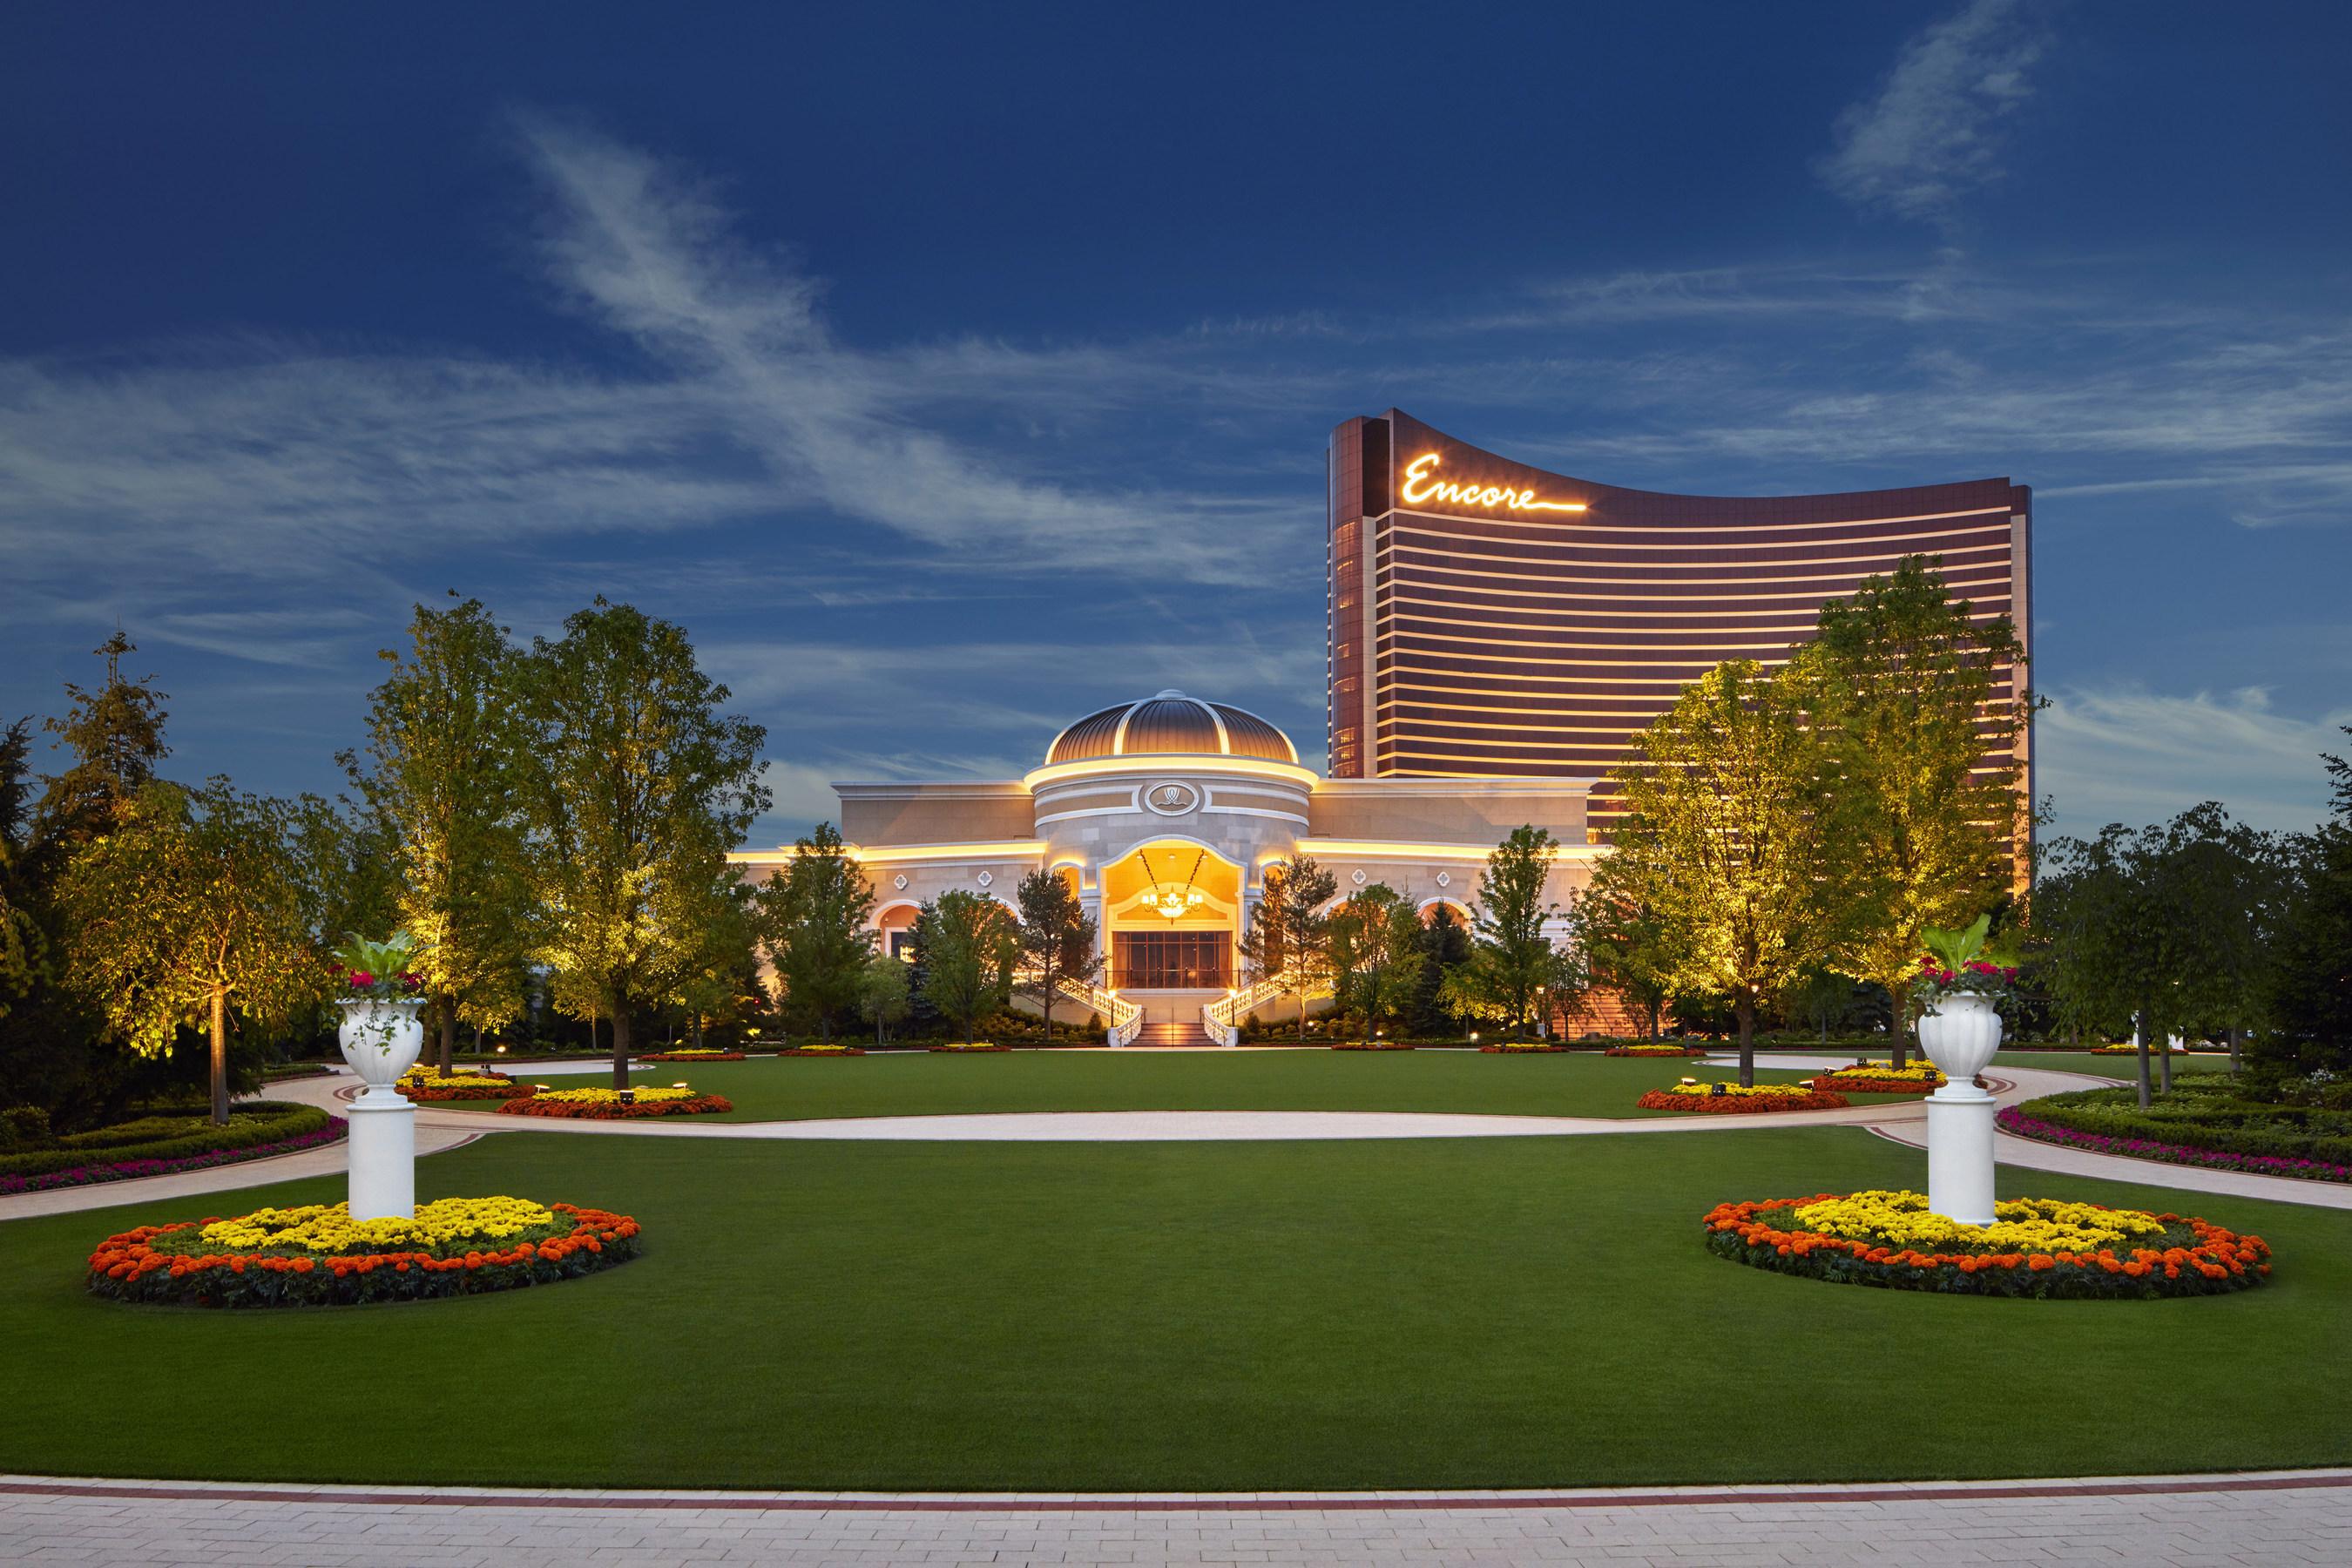 1 Casino Stock to Buy in 2020